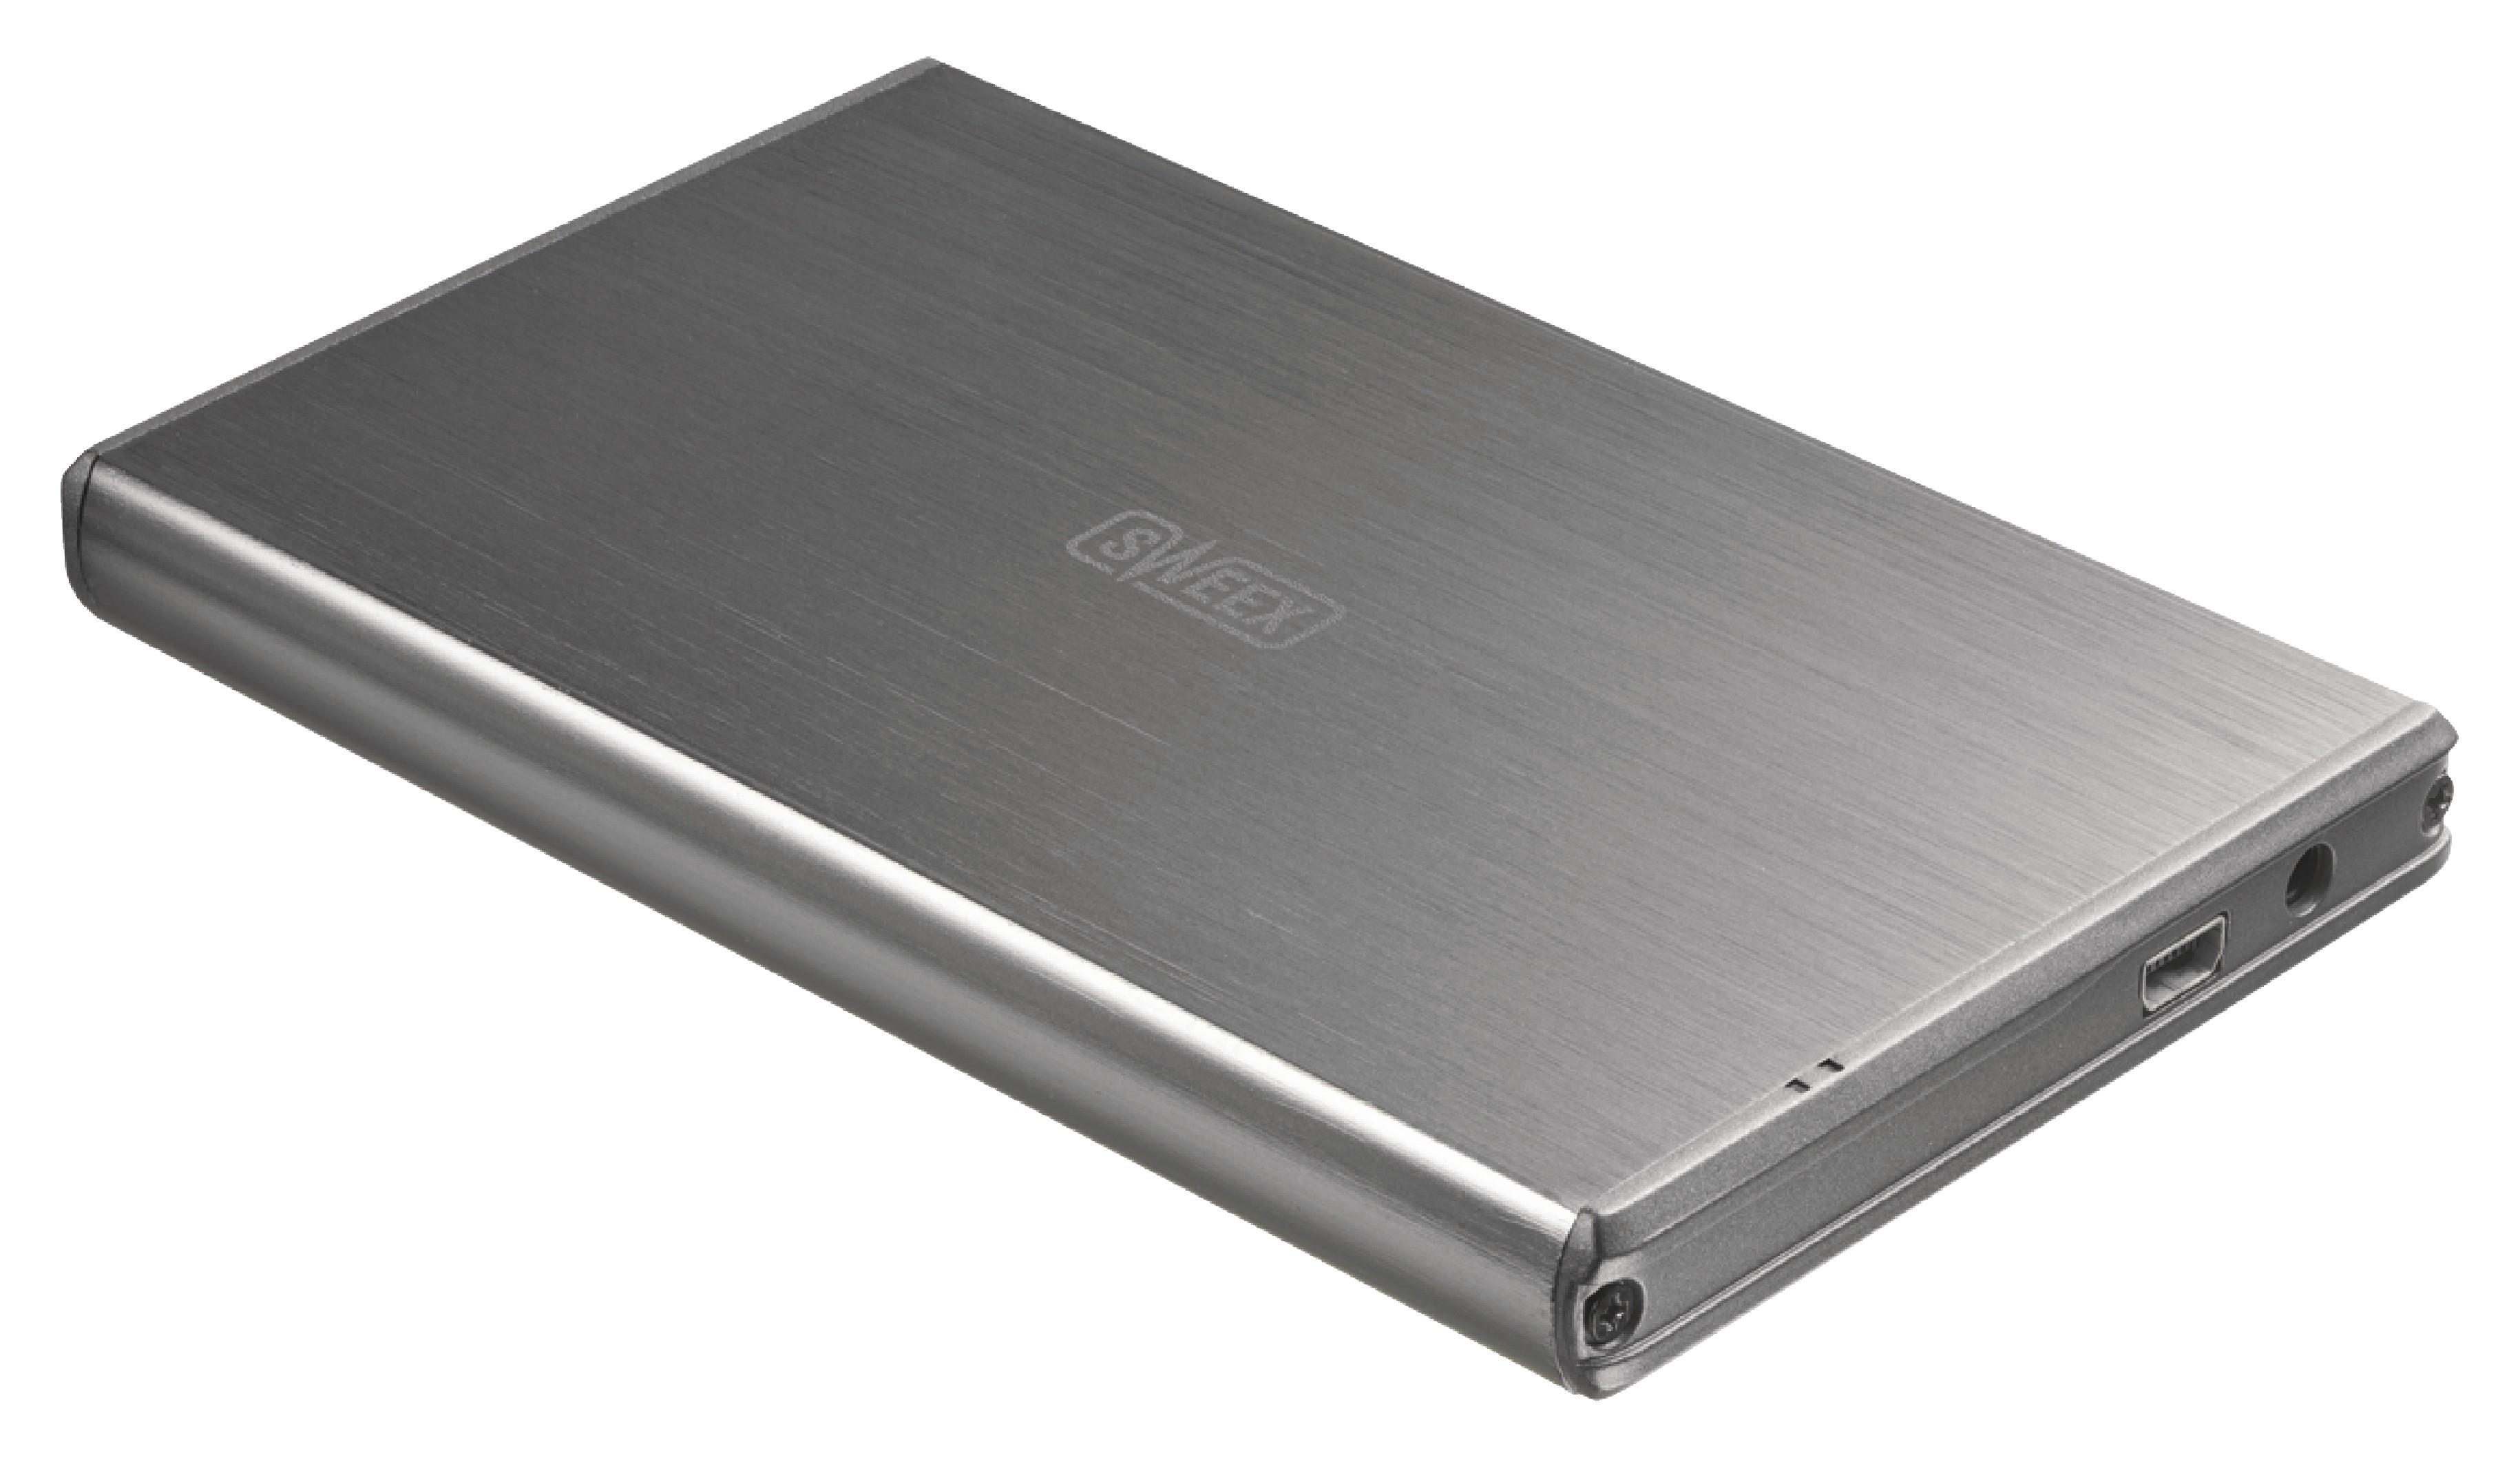 "Externí box Sweex pro pevný disk 2.5"" SATA USB 3.0, ST061"